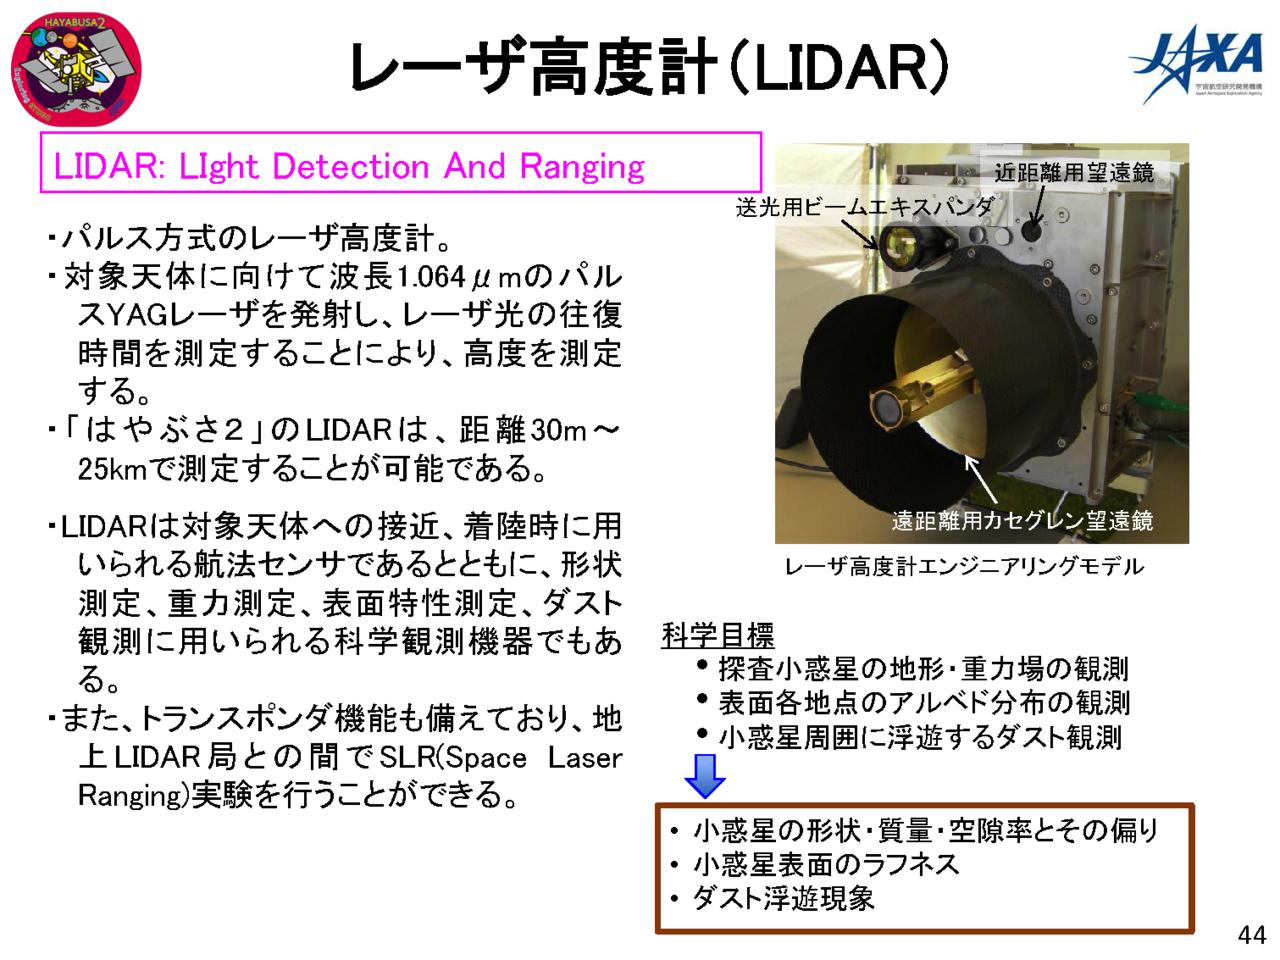 f:id:Imamura:20180802150004p:plain